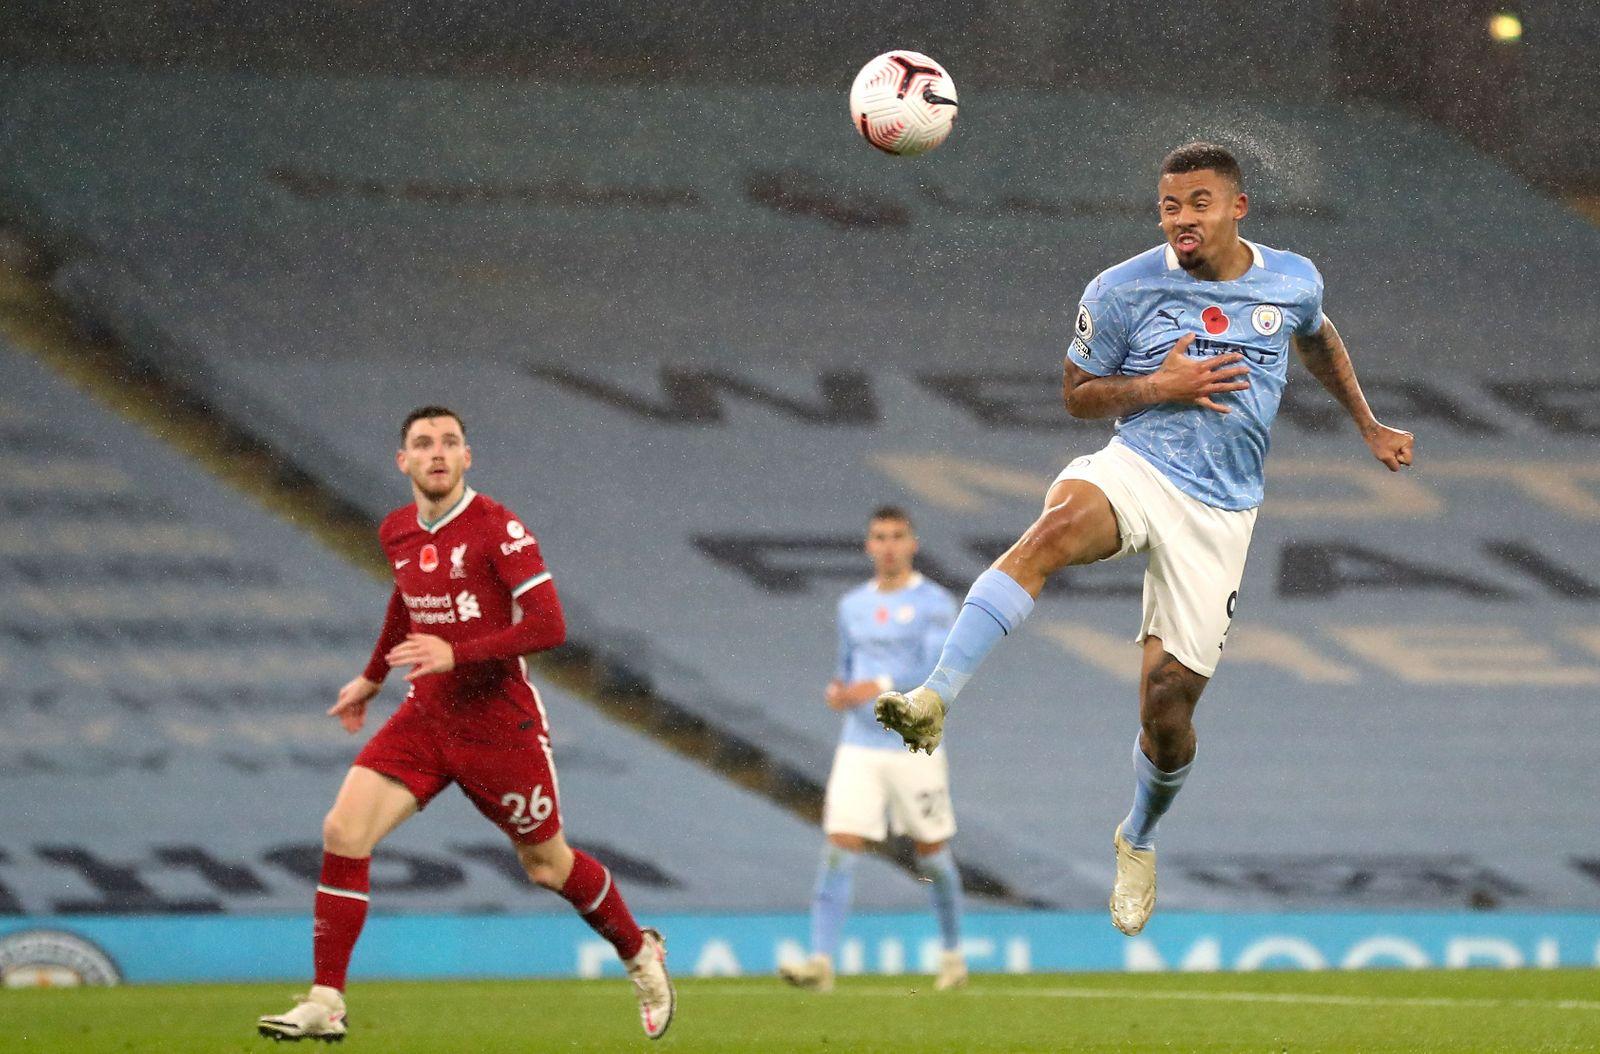 Manchester City vs Liverpool FC, United Kingdom - 08 Nov 2020